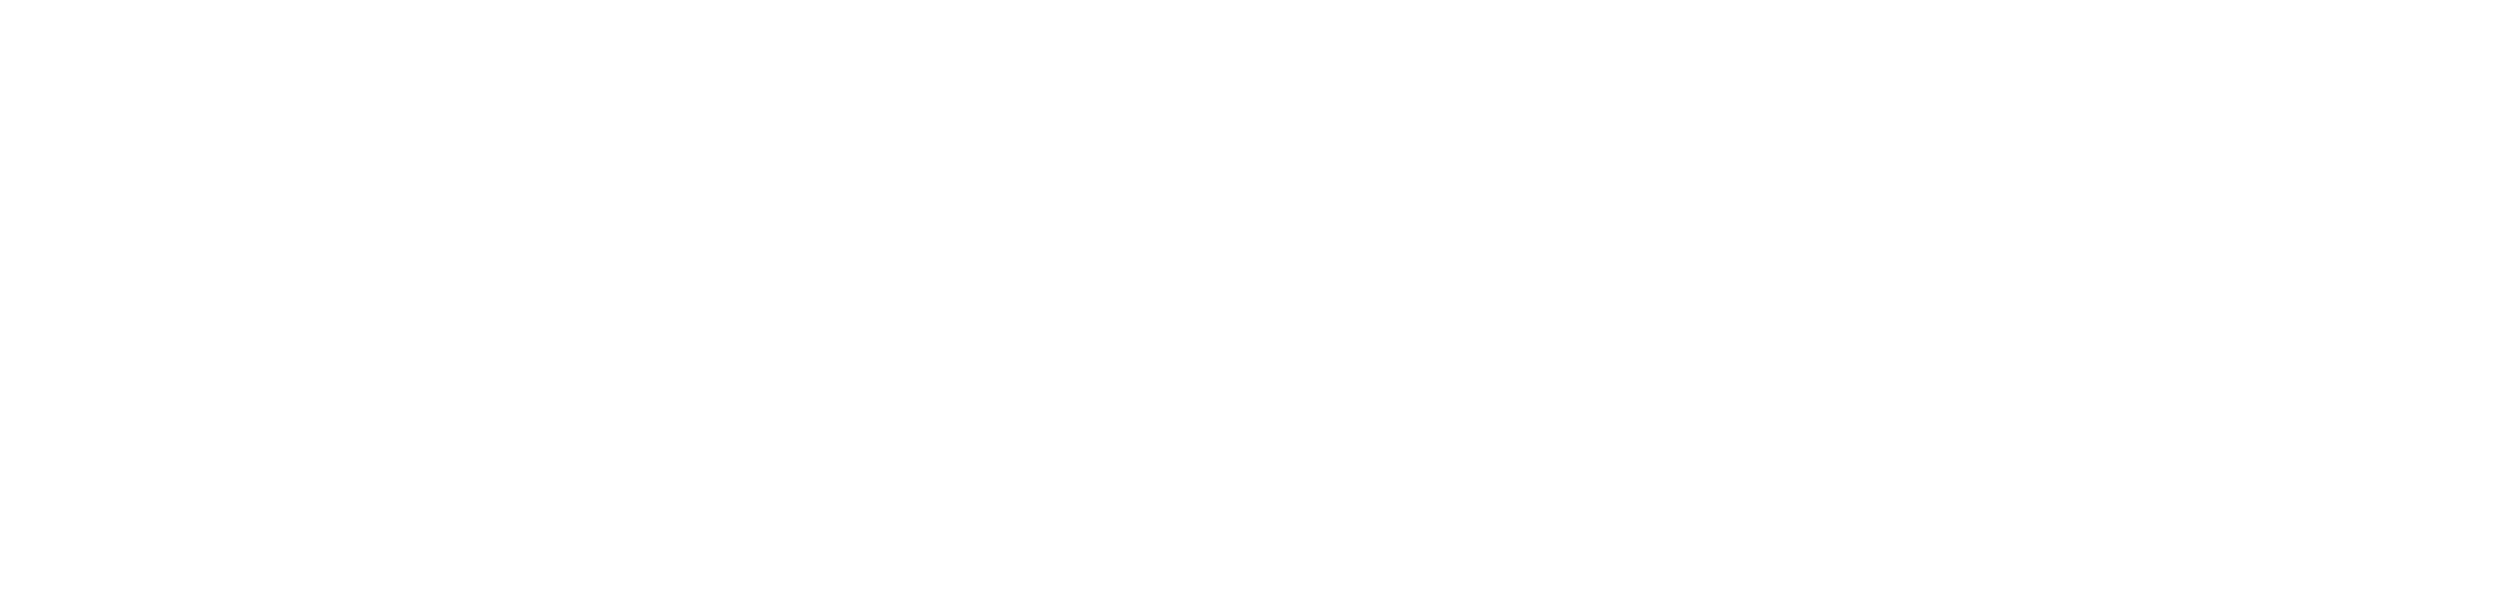 EthanMusolini Logo-01